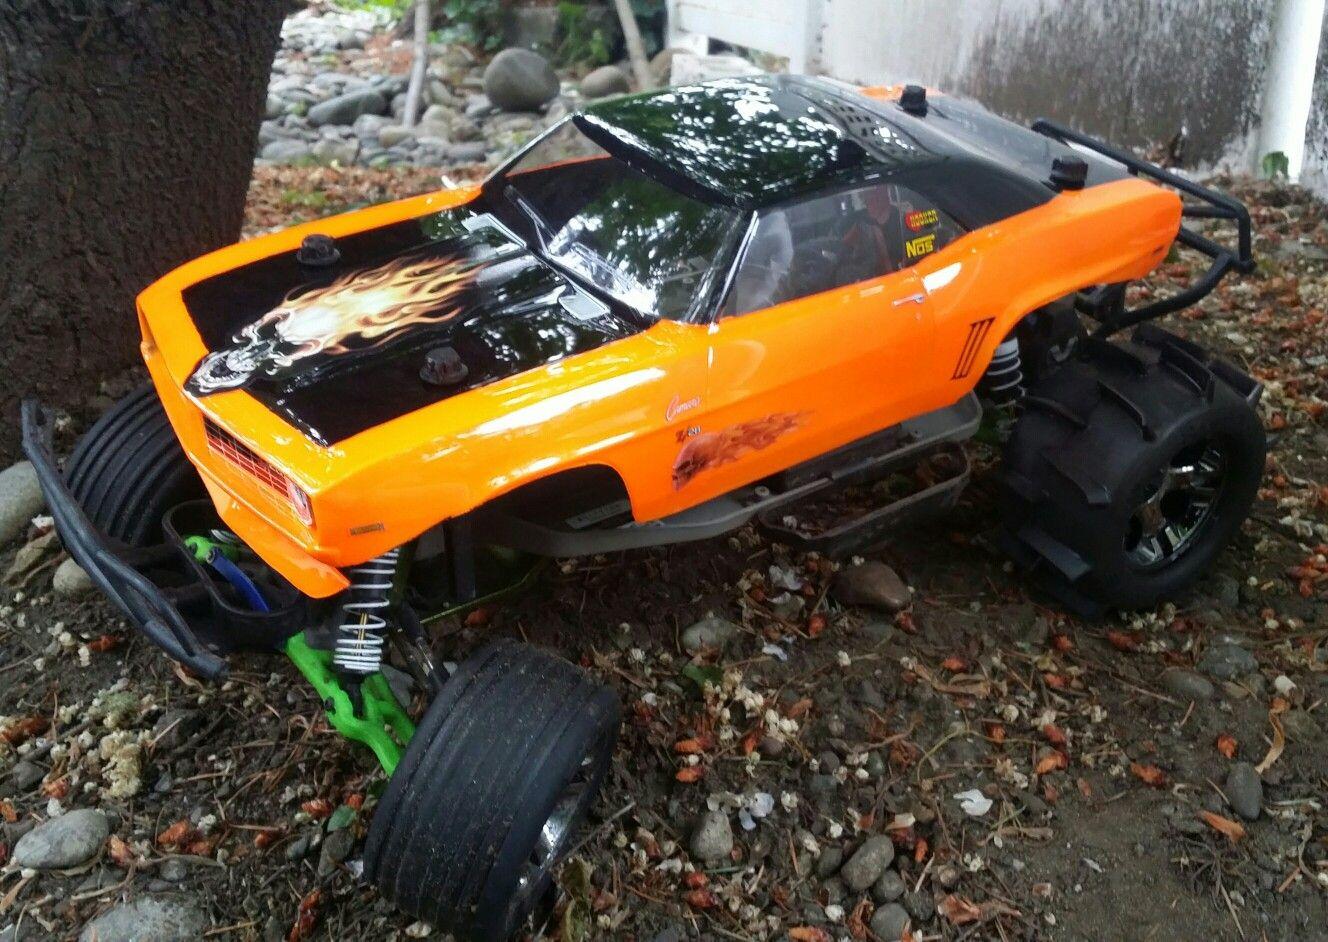 Modified Traxxas Slash 2x4 With 69 Comaro Body Paddle Tires